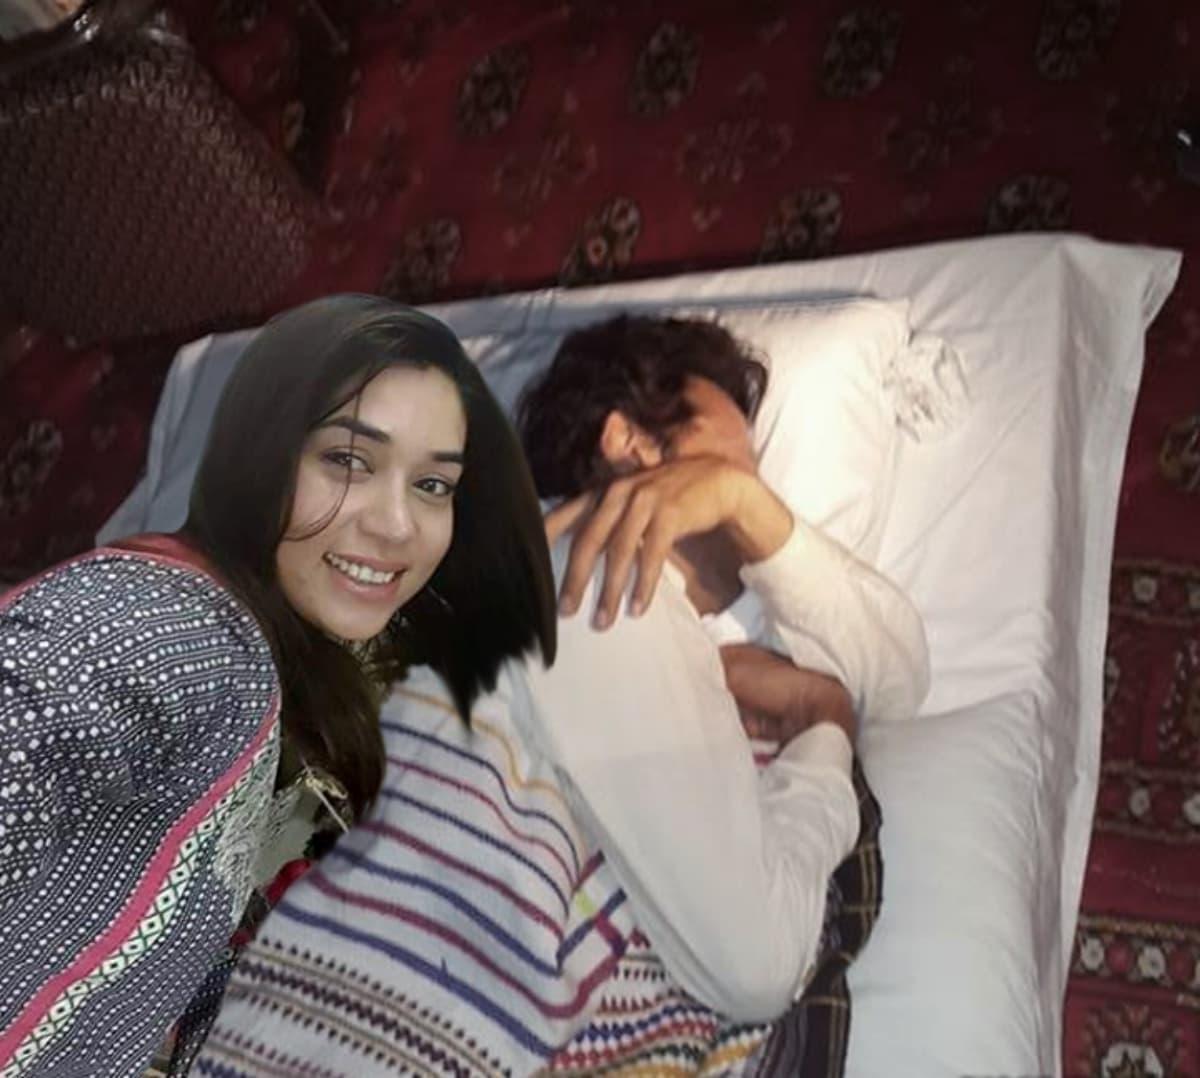 An unsuspecting Imran Khan becomes her next target